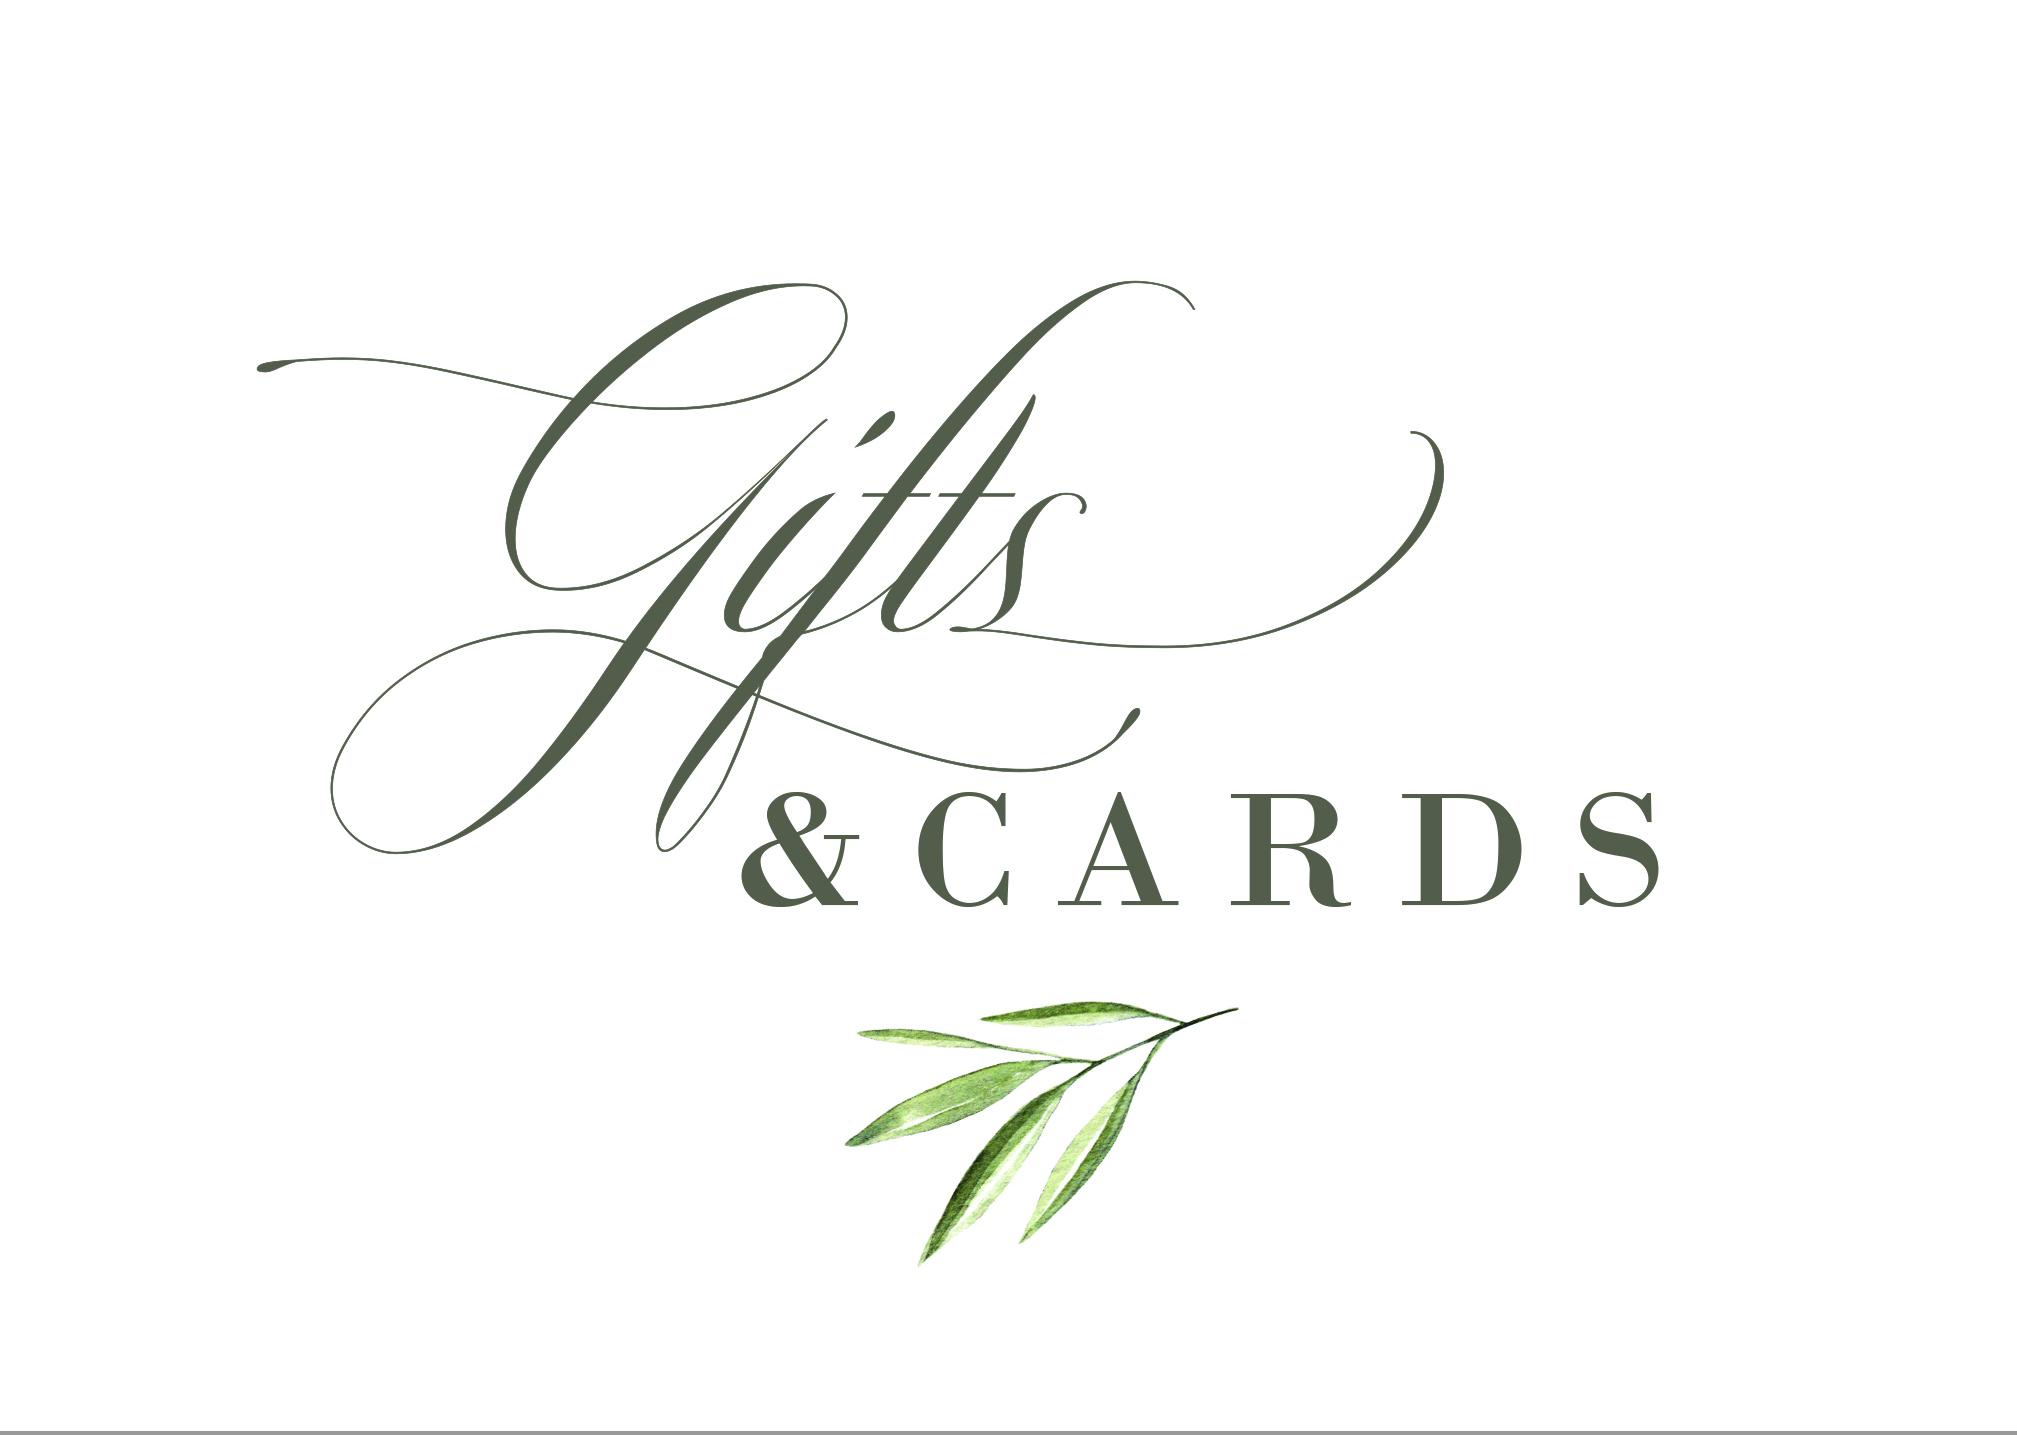 MODERN GREENERY GIFTS & CARDS SIGN.jpg